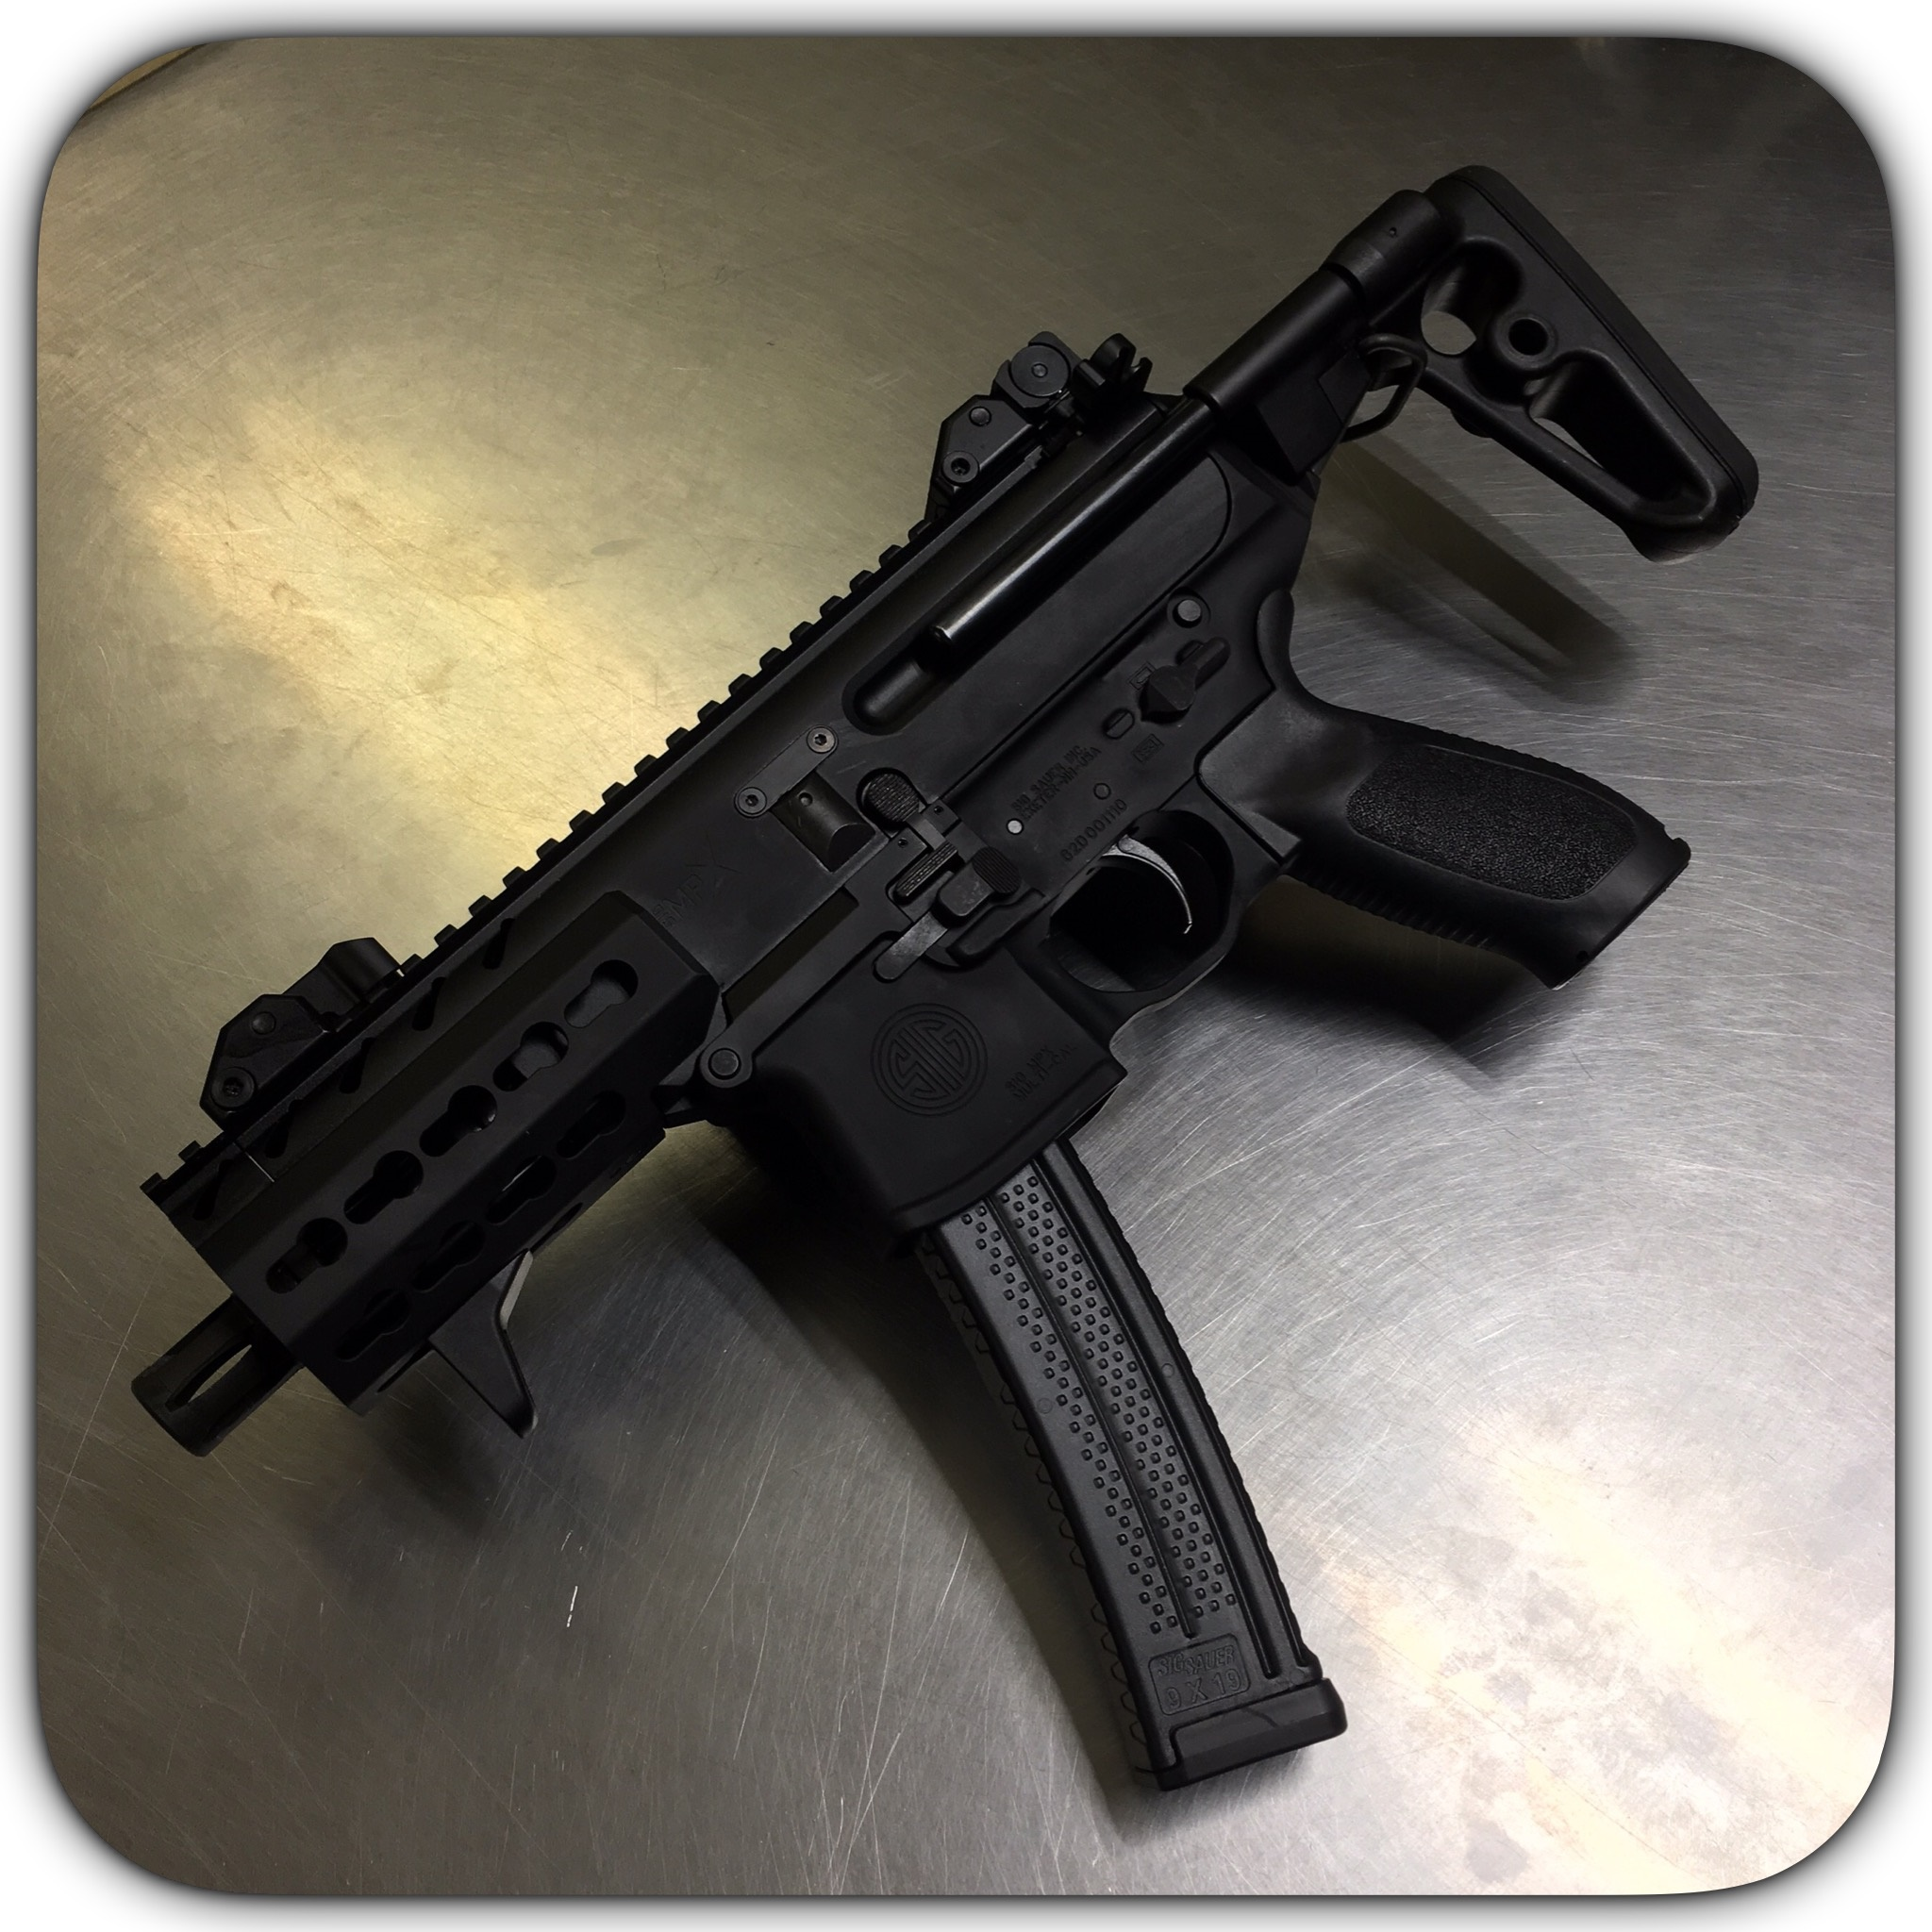 Sig MPX 9mm SBR With 4 5